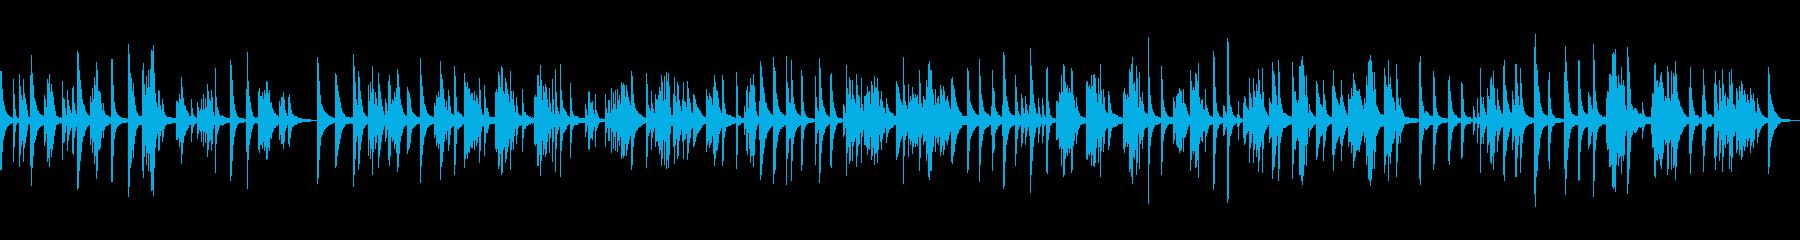 KANTリラックスピアノBGM0706の再生済みの波形